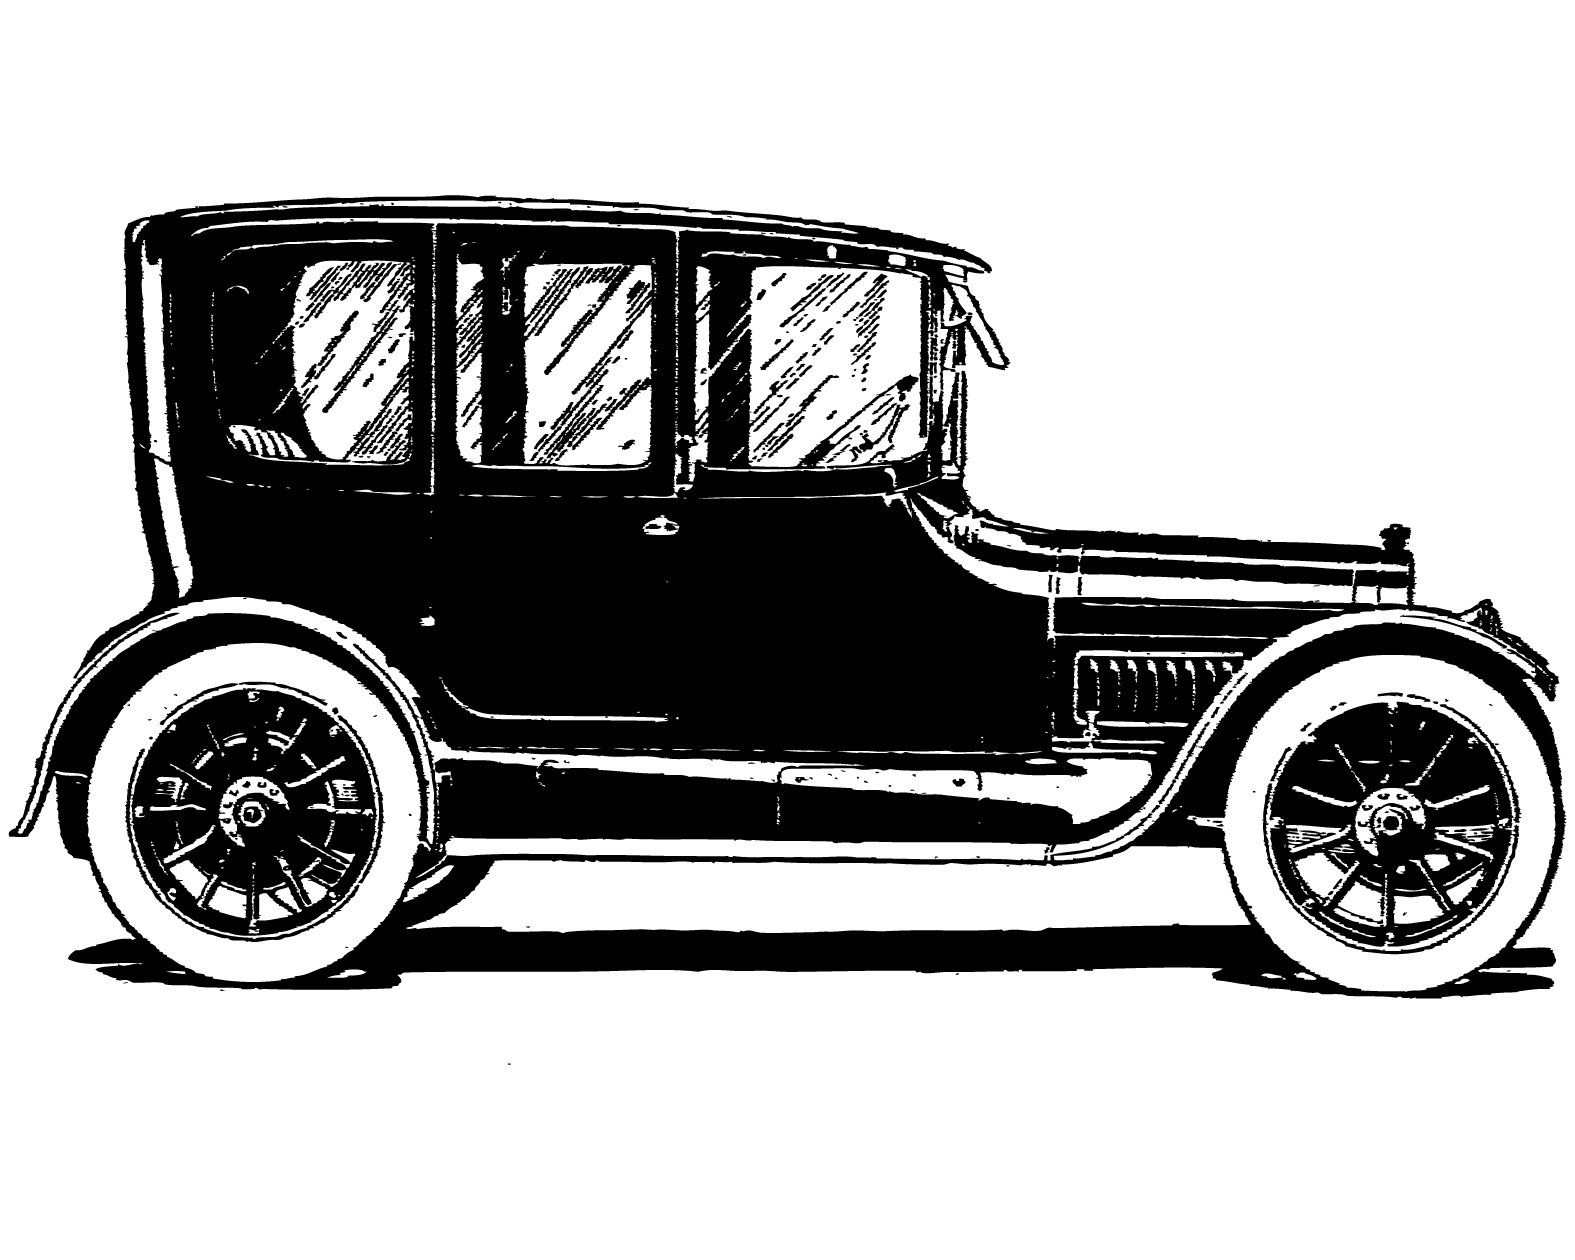 Free vintage clip art images september 2012 for Car carriage